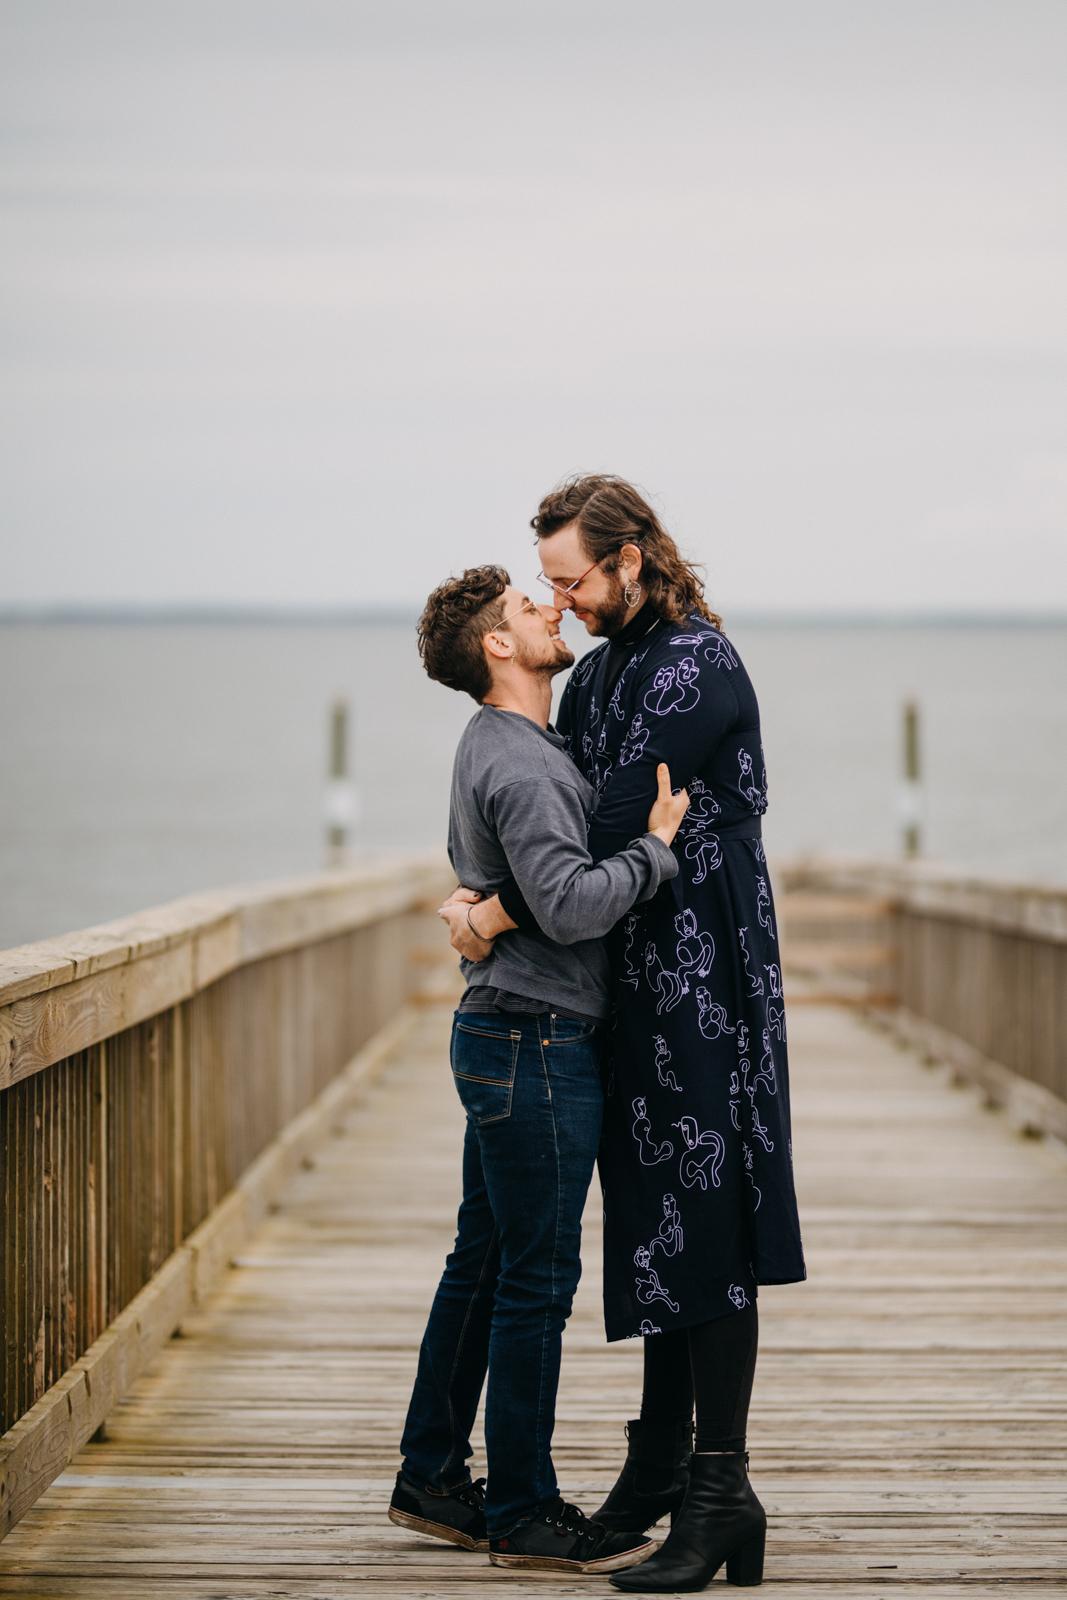 trans-couple-queer-photographer12.jpg